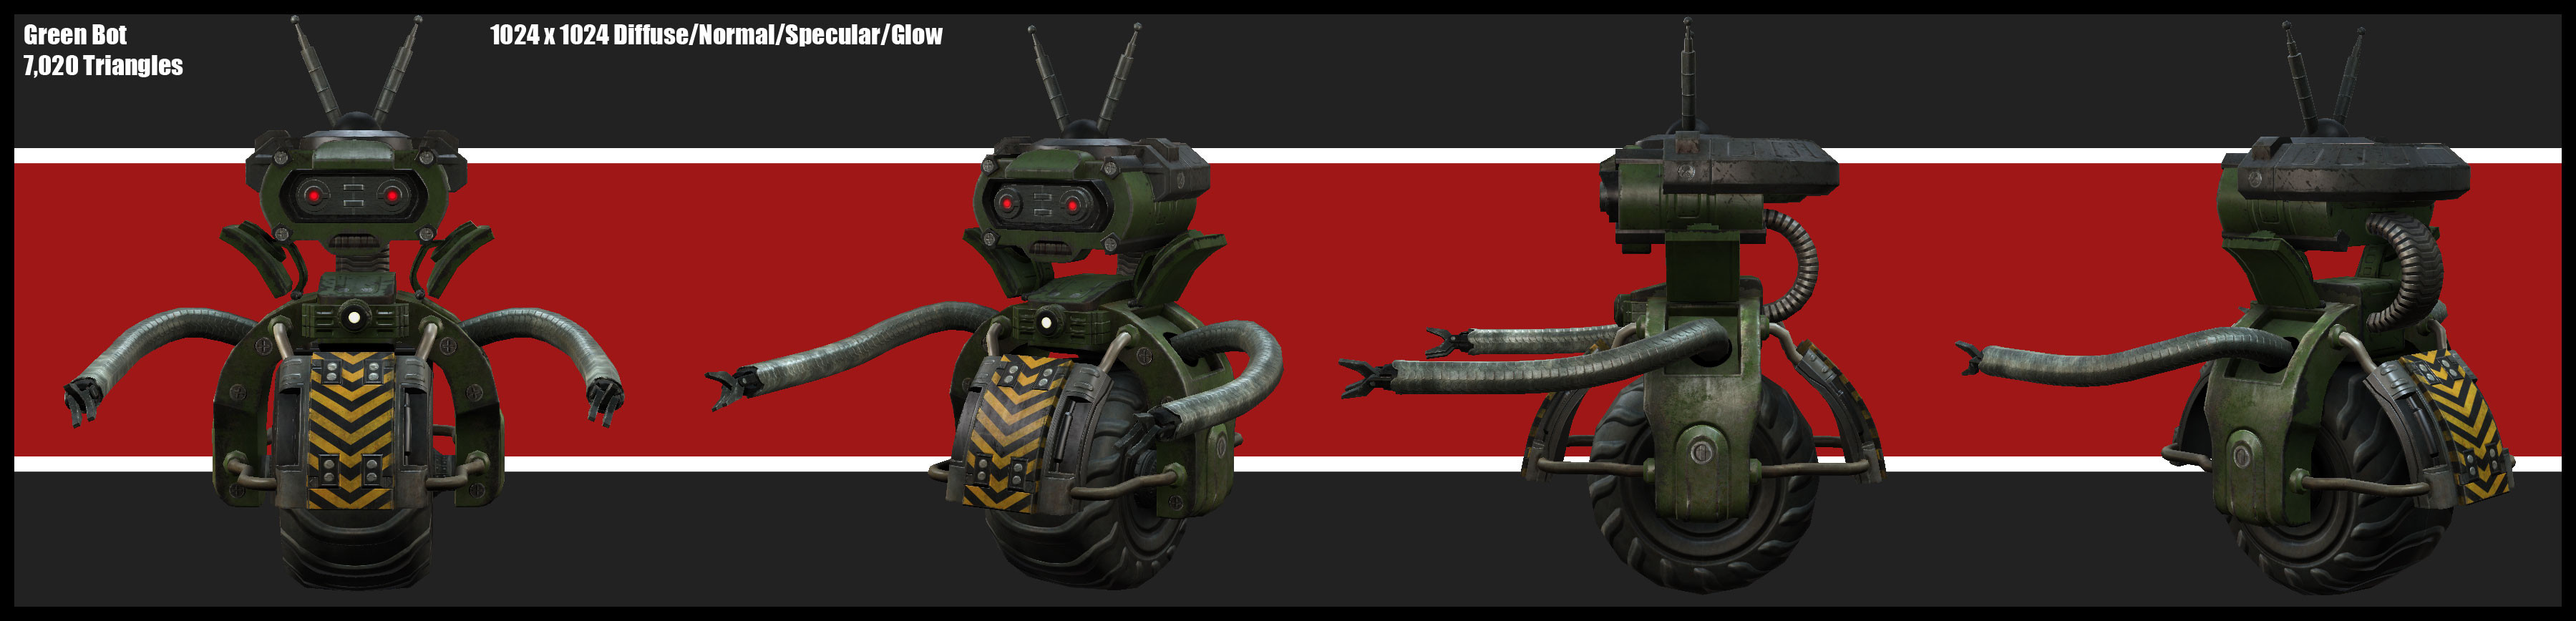 A robot inspired by the 1980s Teenage Mutant Ninja Turtles cartoon.